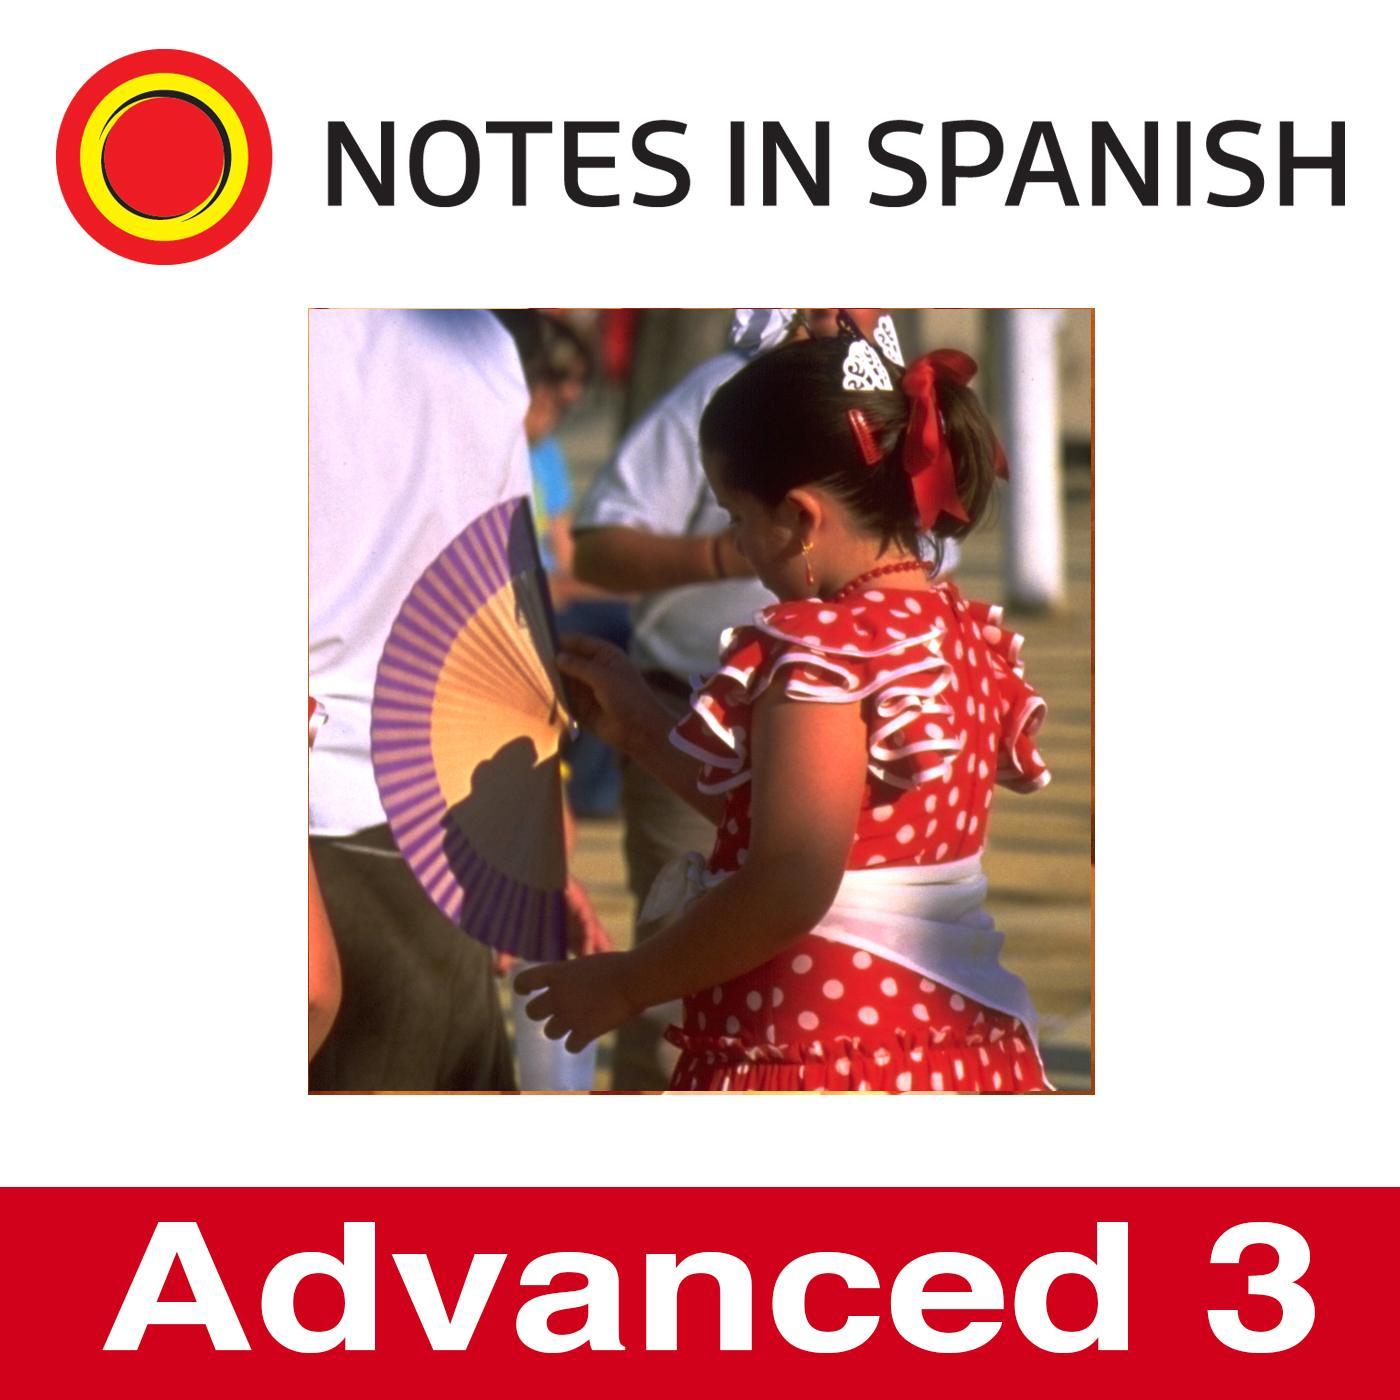 NIS Advanced S3 - 09 - Bienvenido Introvertido